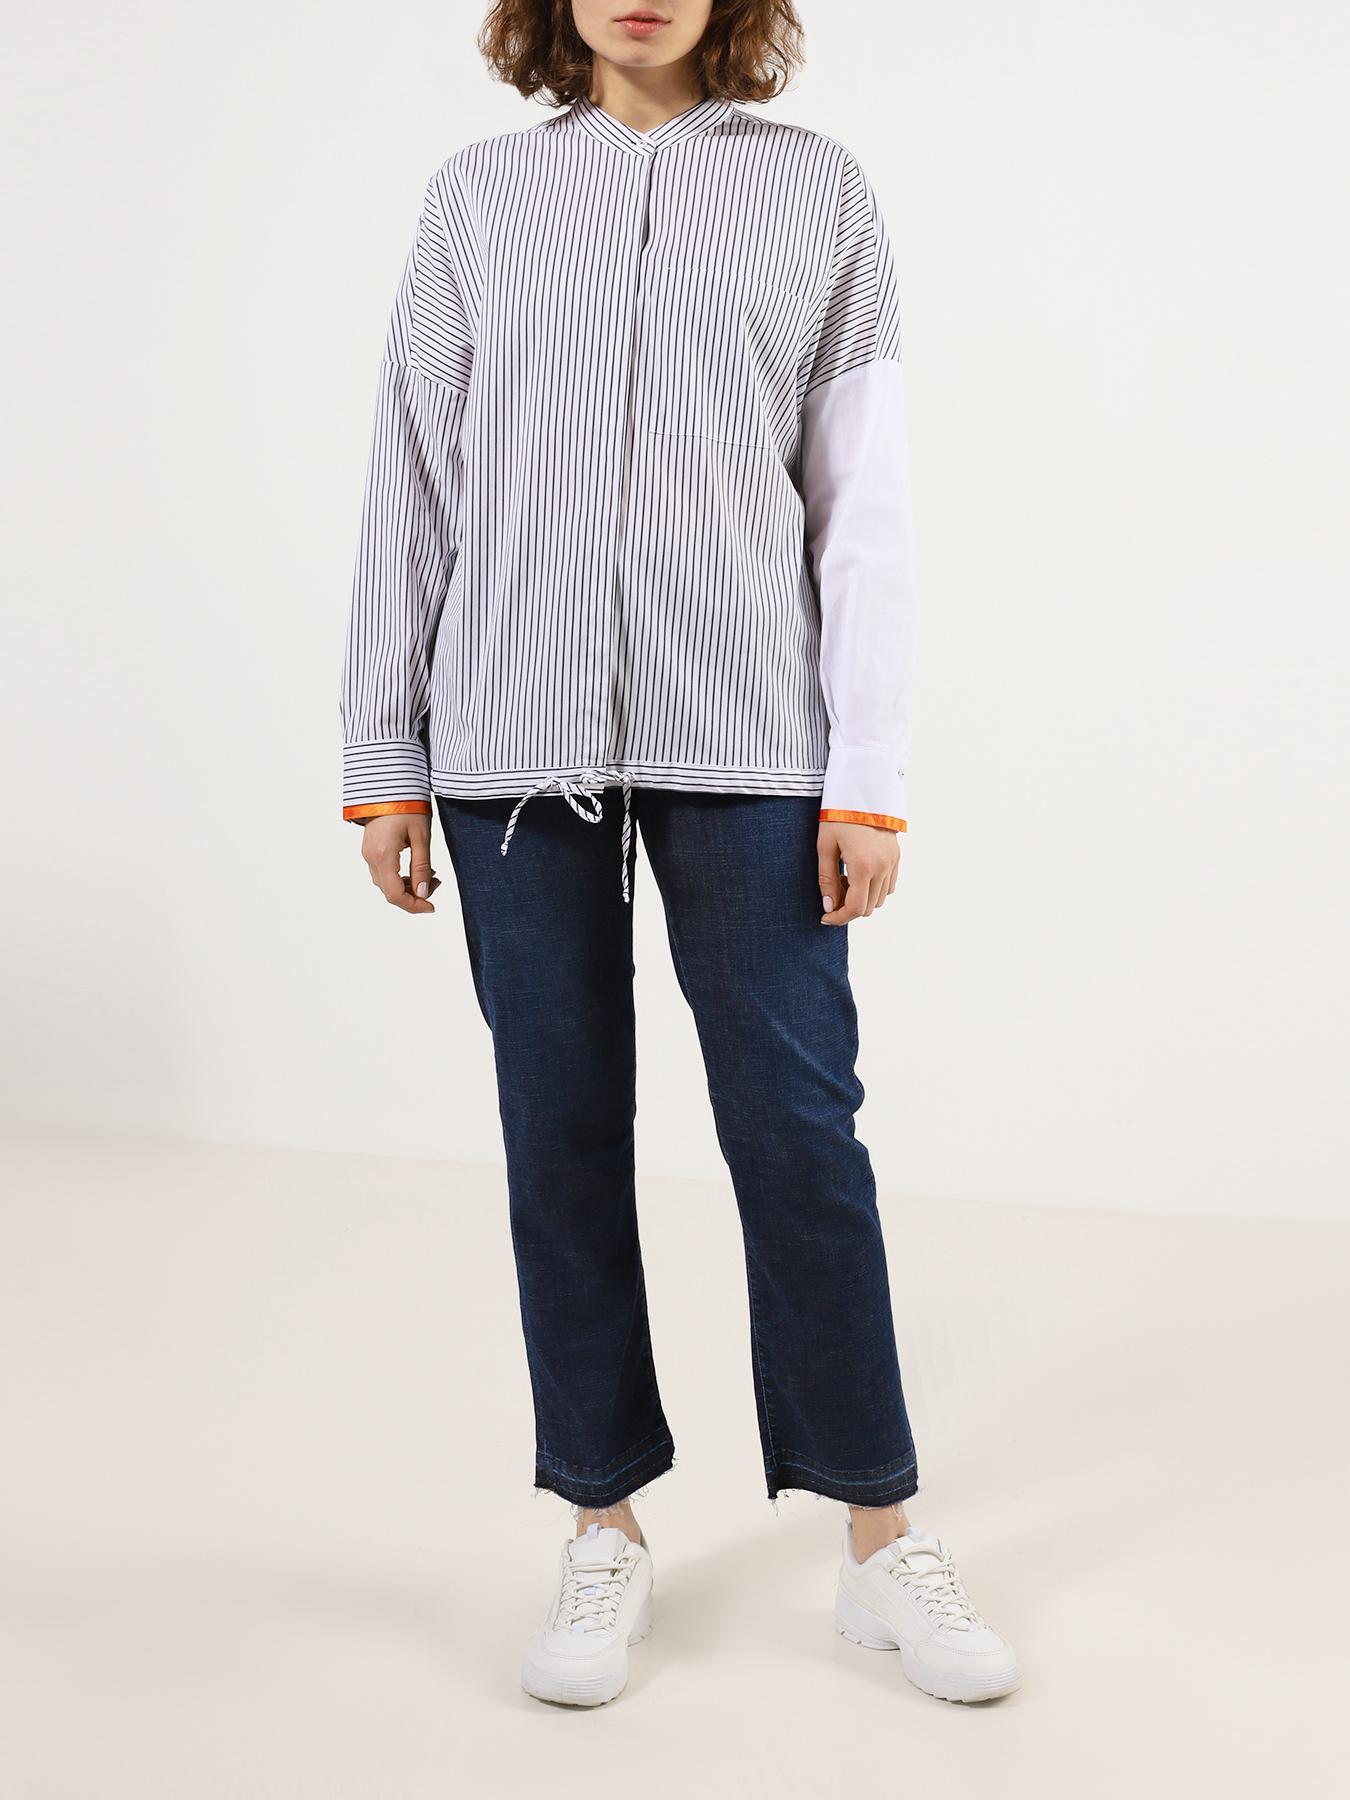 Брюки Trussardi Jeans Джинсы